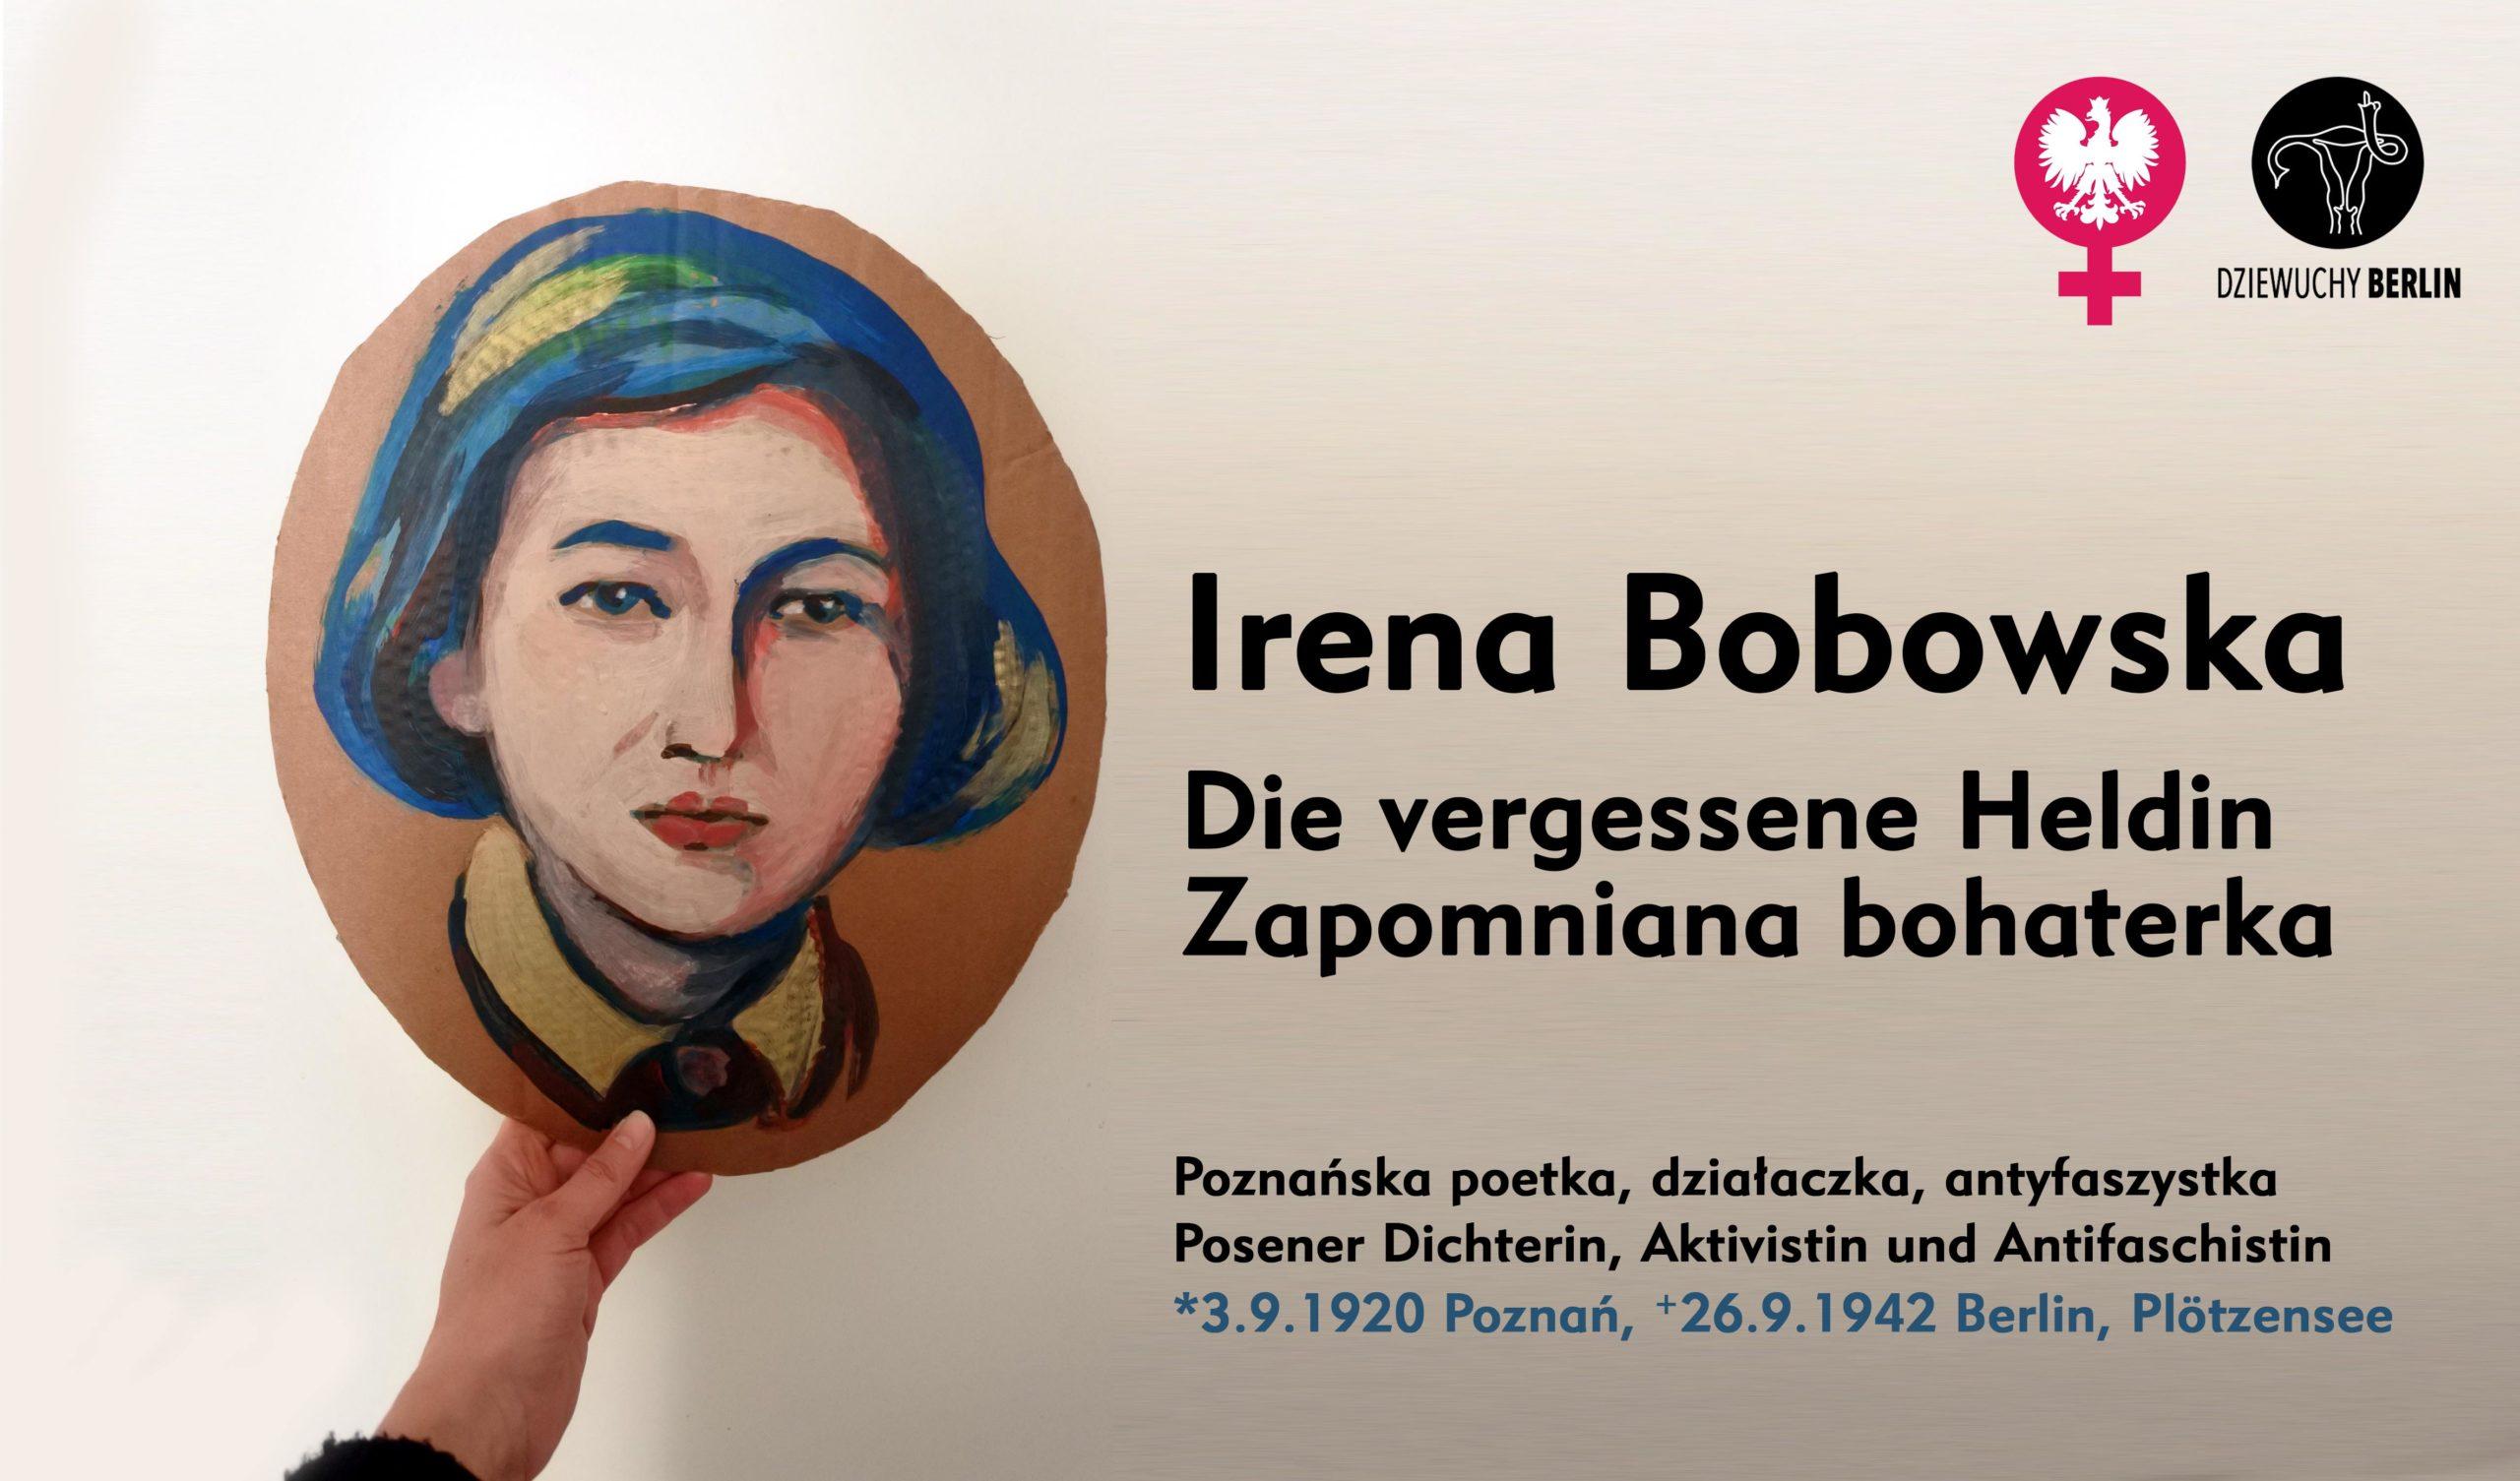 Irena Bobowska – Die vergessene Heldin / Zapomniana bohaterka